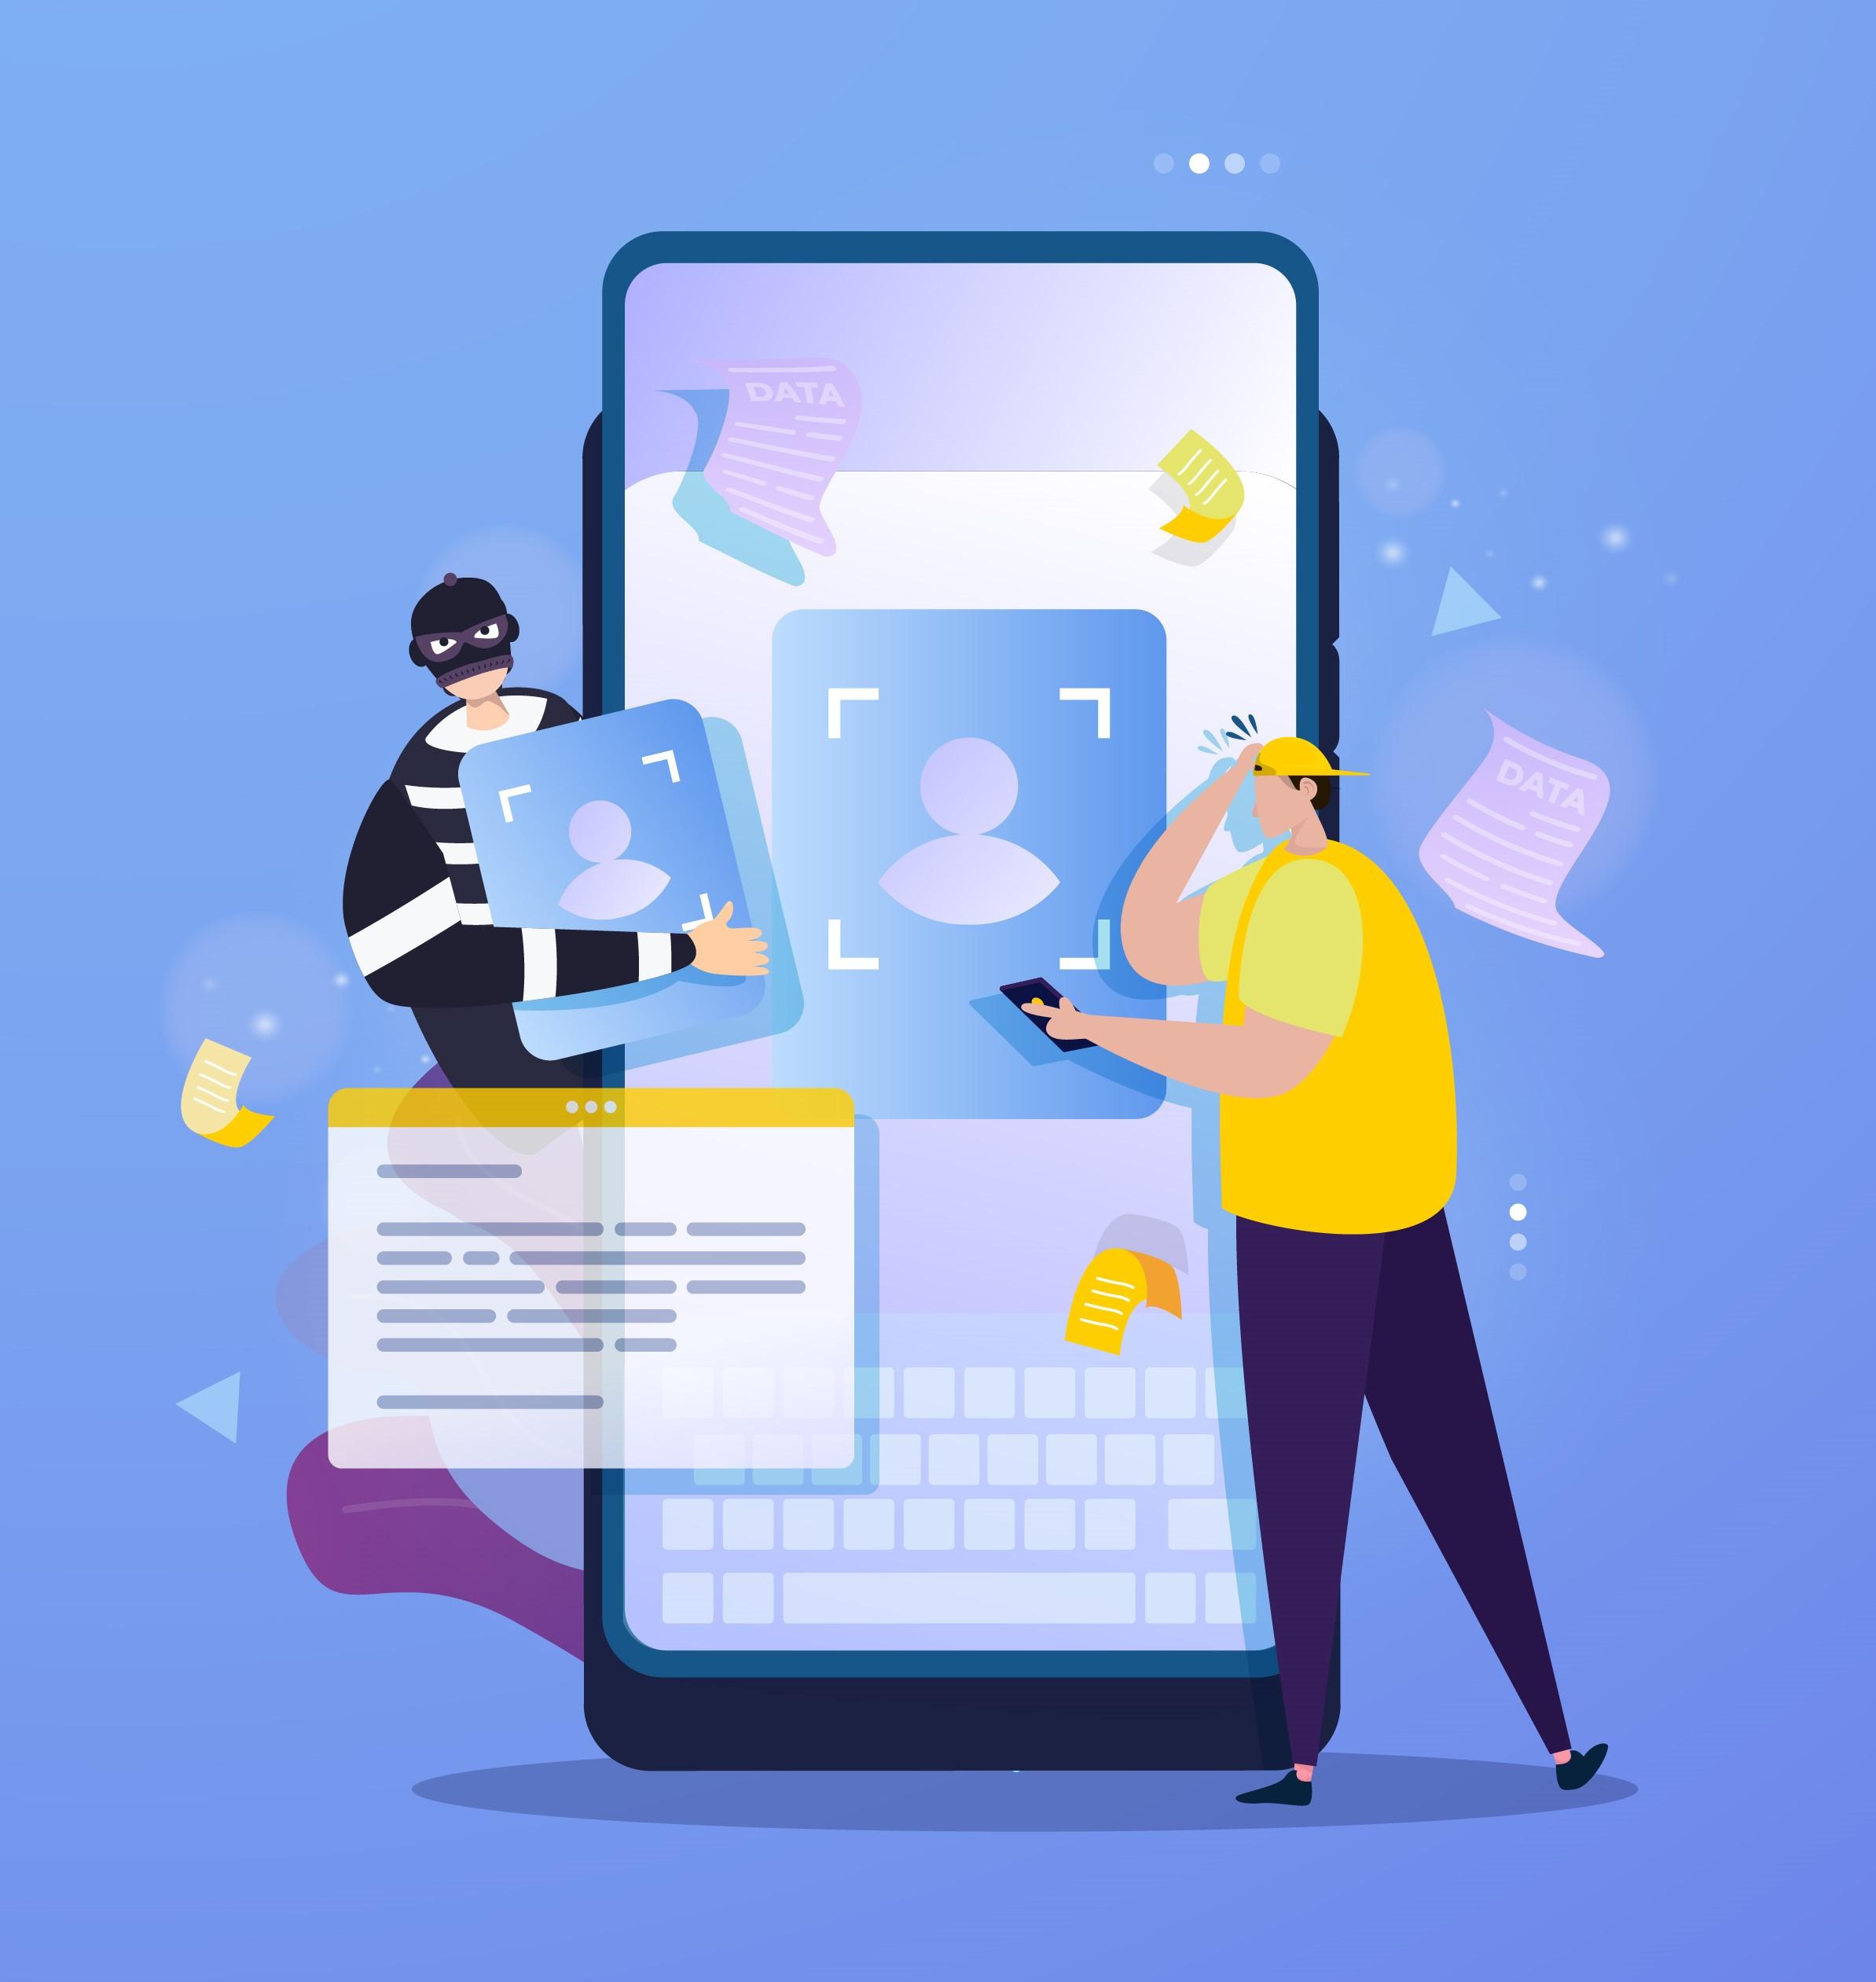 Cyber crimminal stealing biometrics